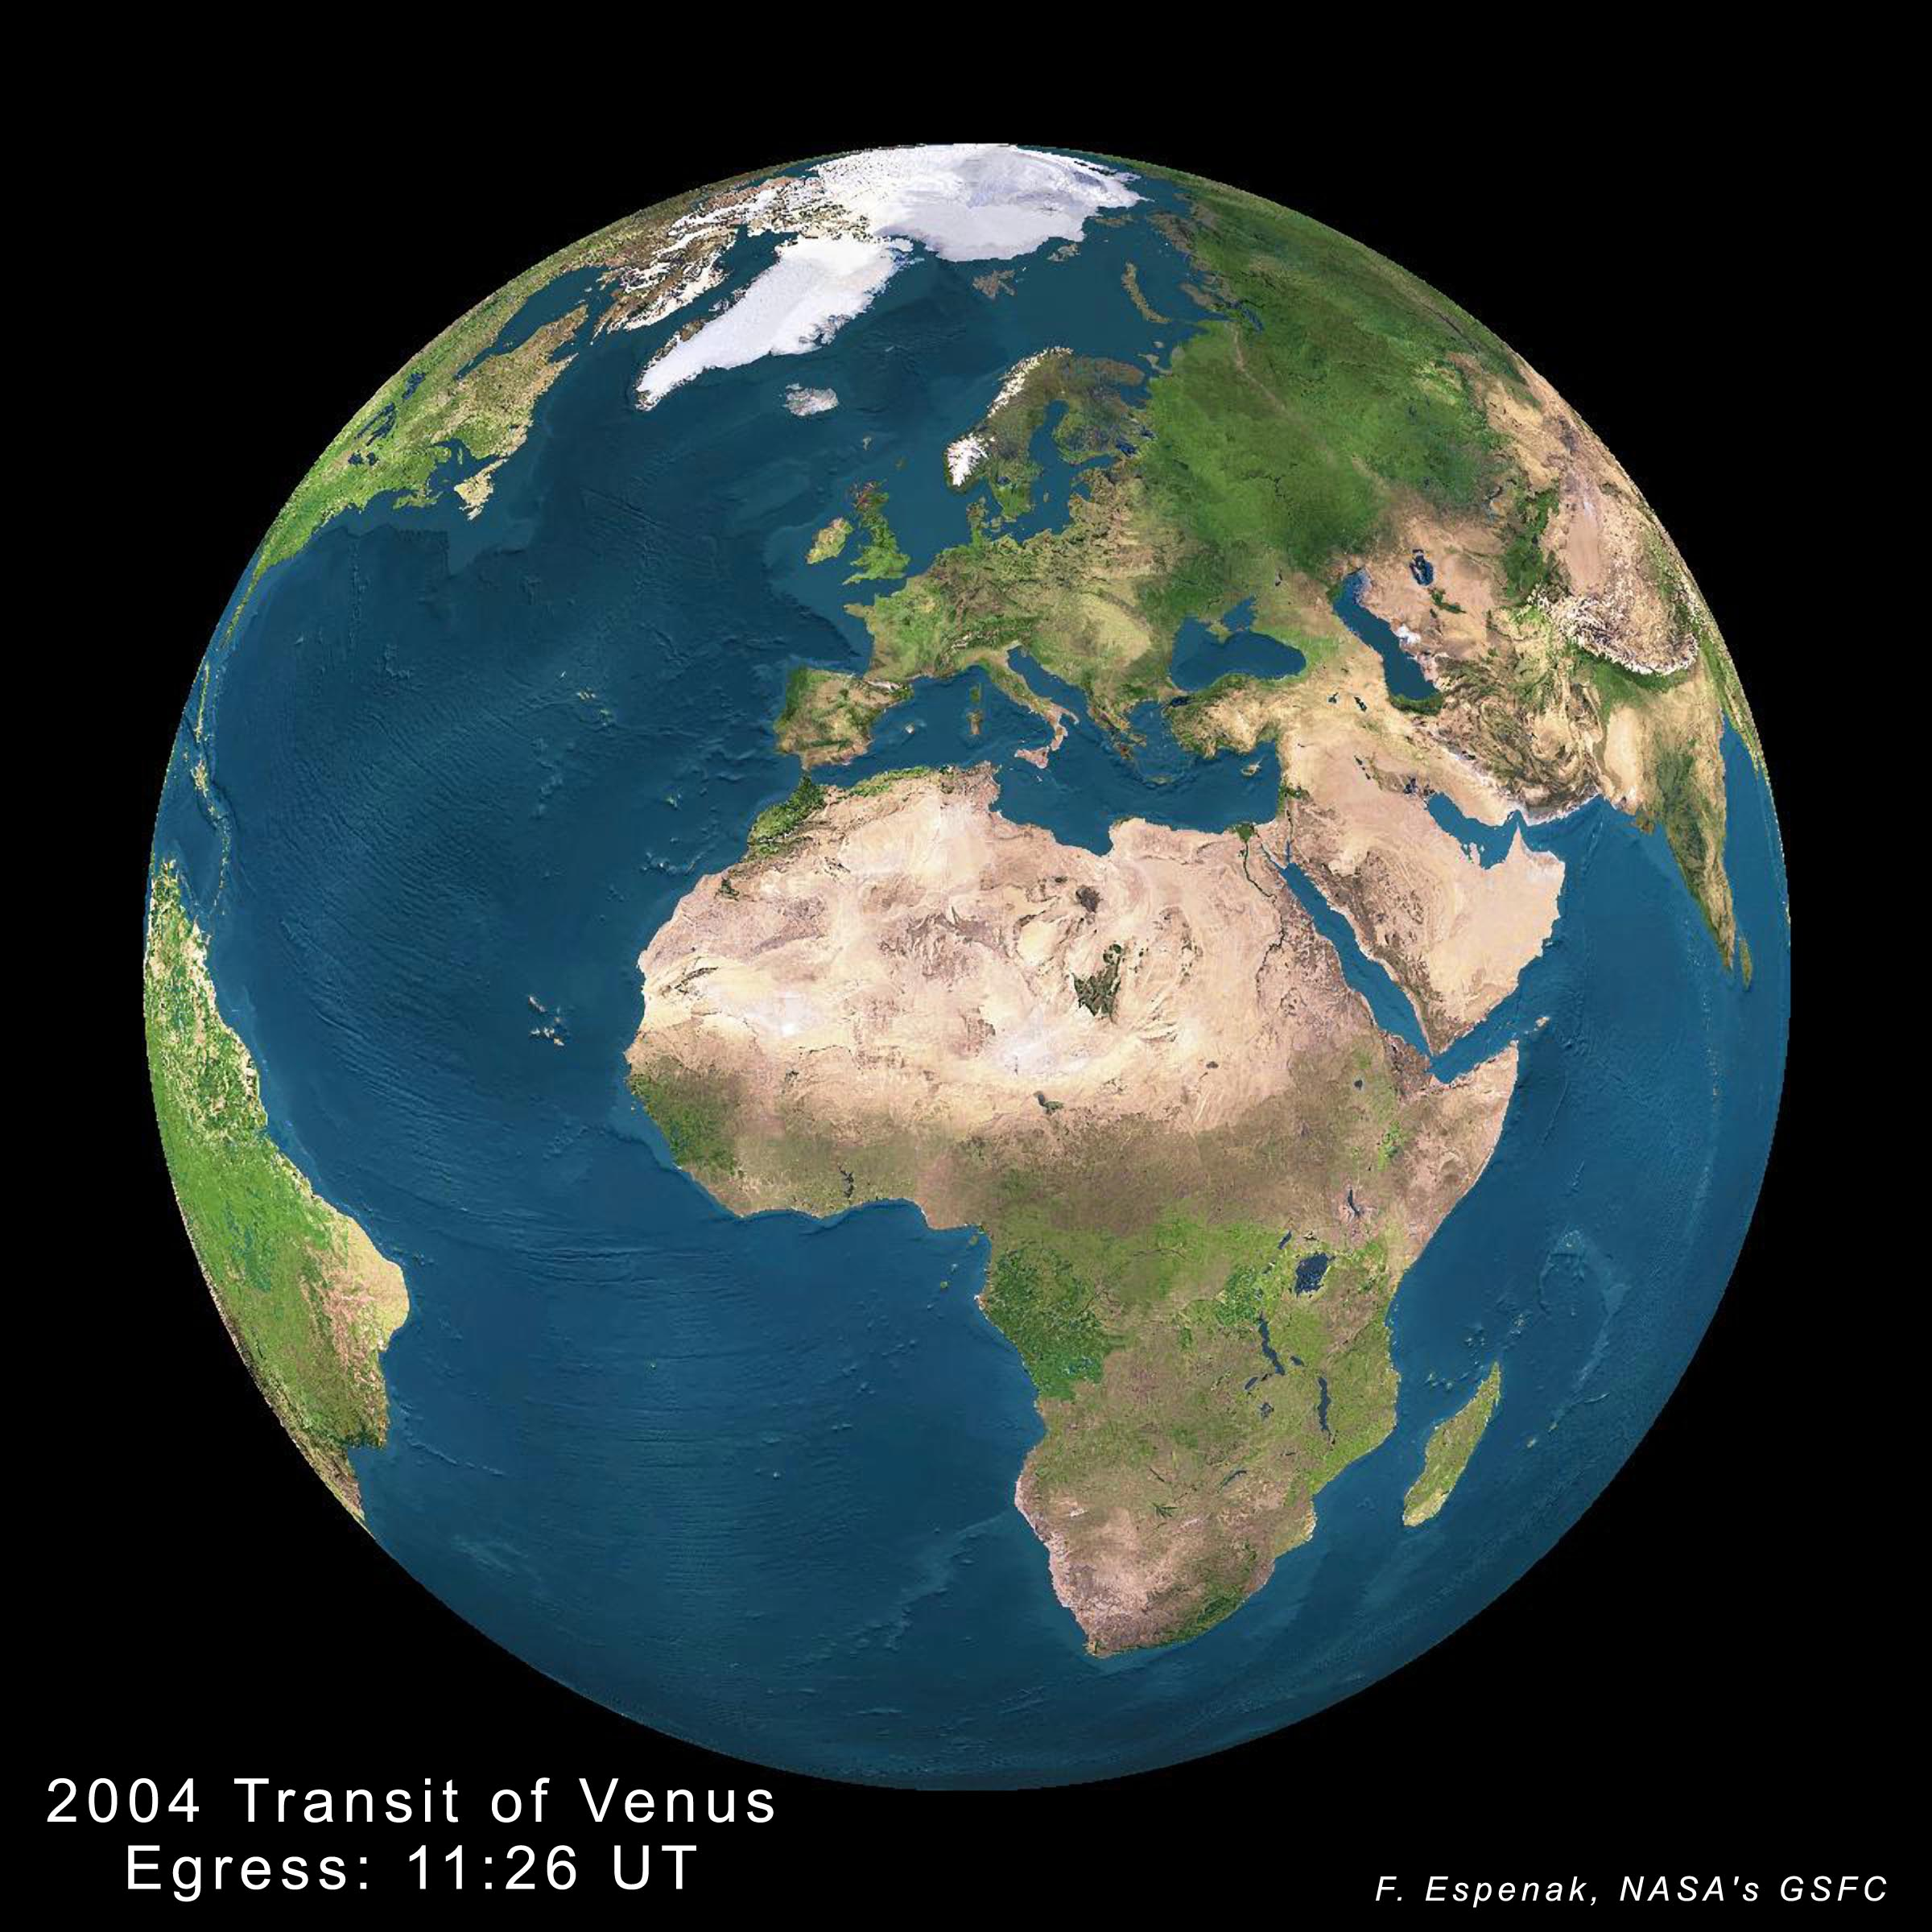 Transit of Venus of June 8, 2004